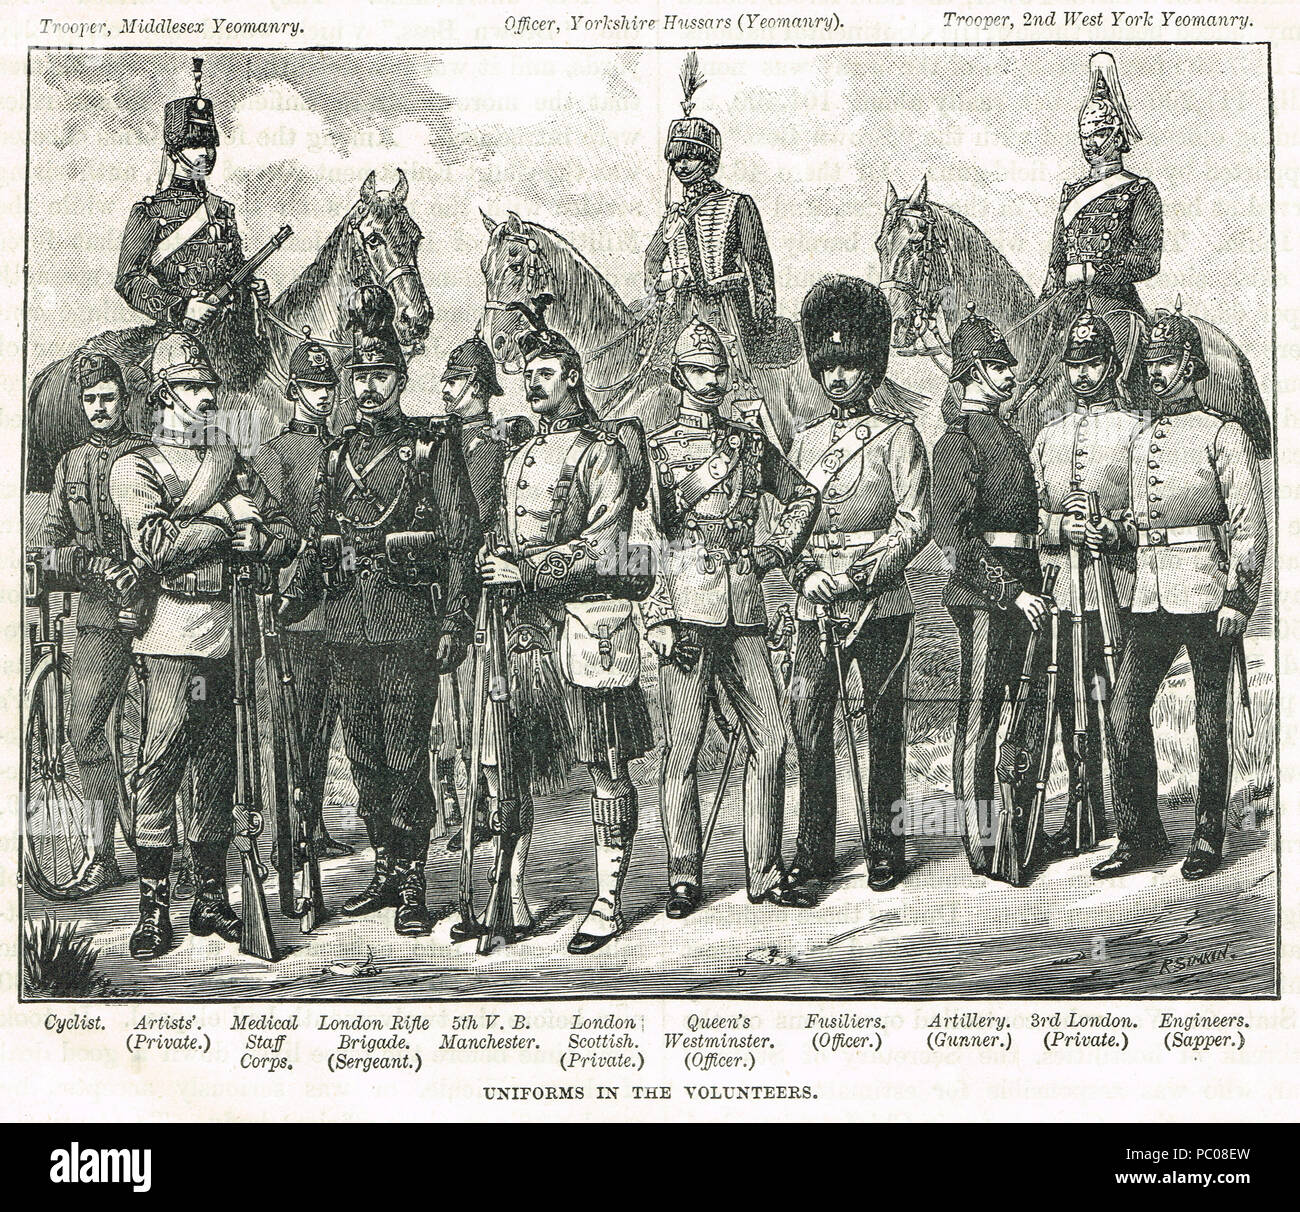 Volunteers uniforms of the 19th century, - Stock Image